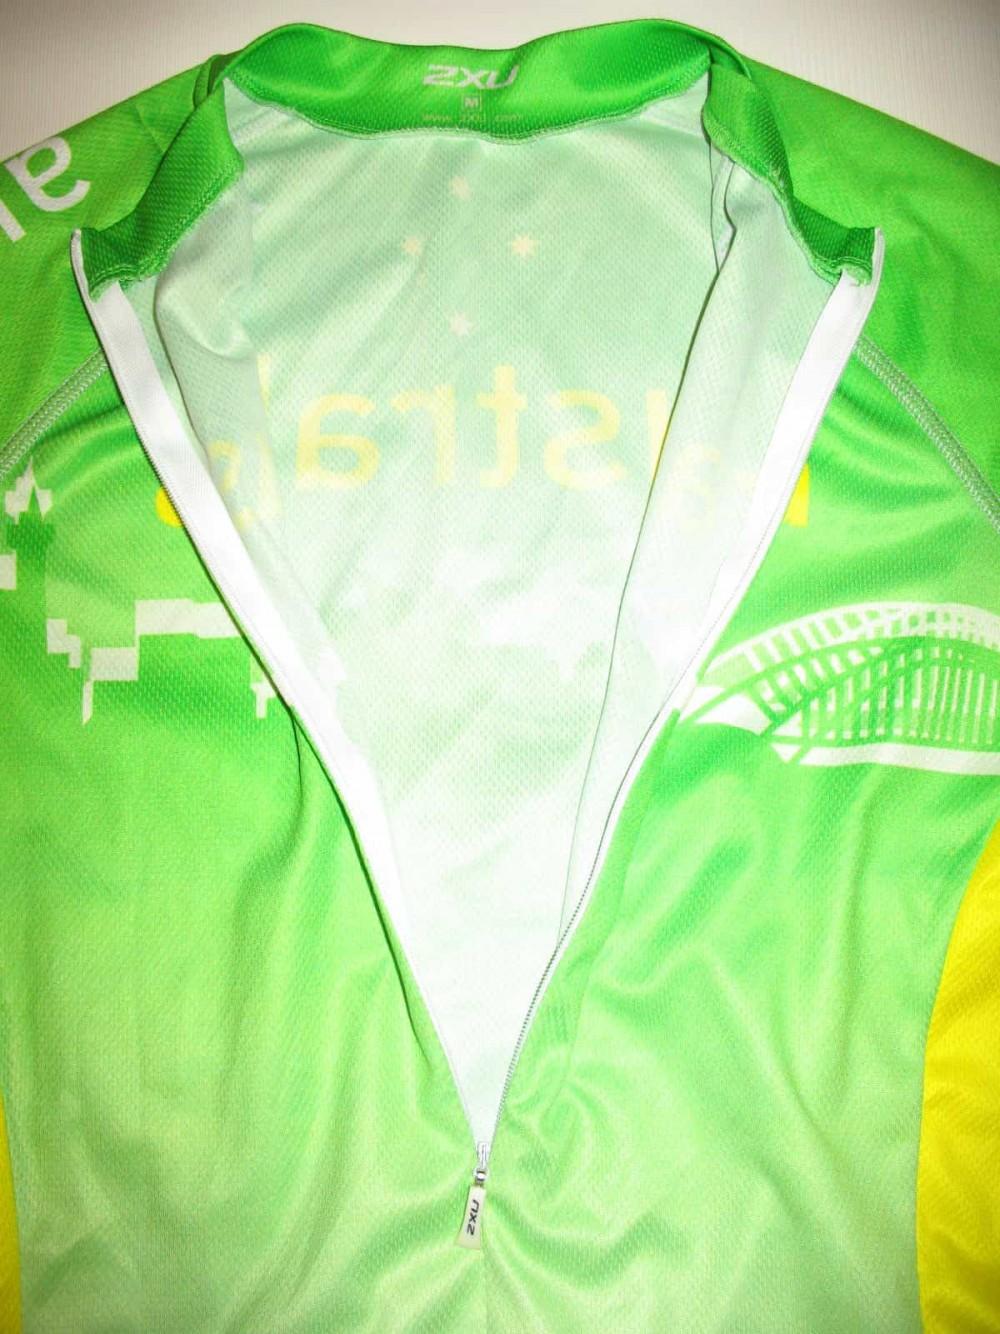 Веломайка 2XU australia cycling jersey lady (размер M) - 3